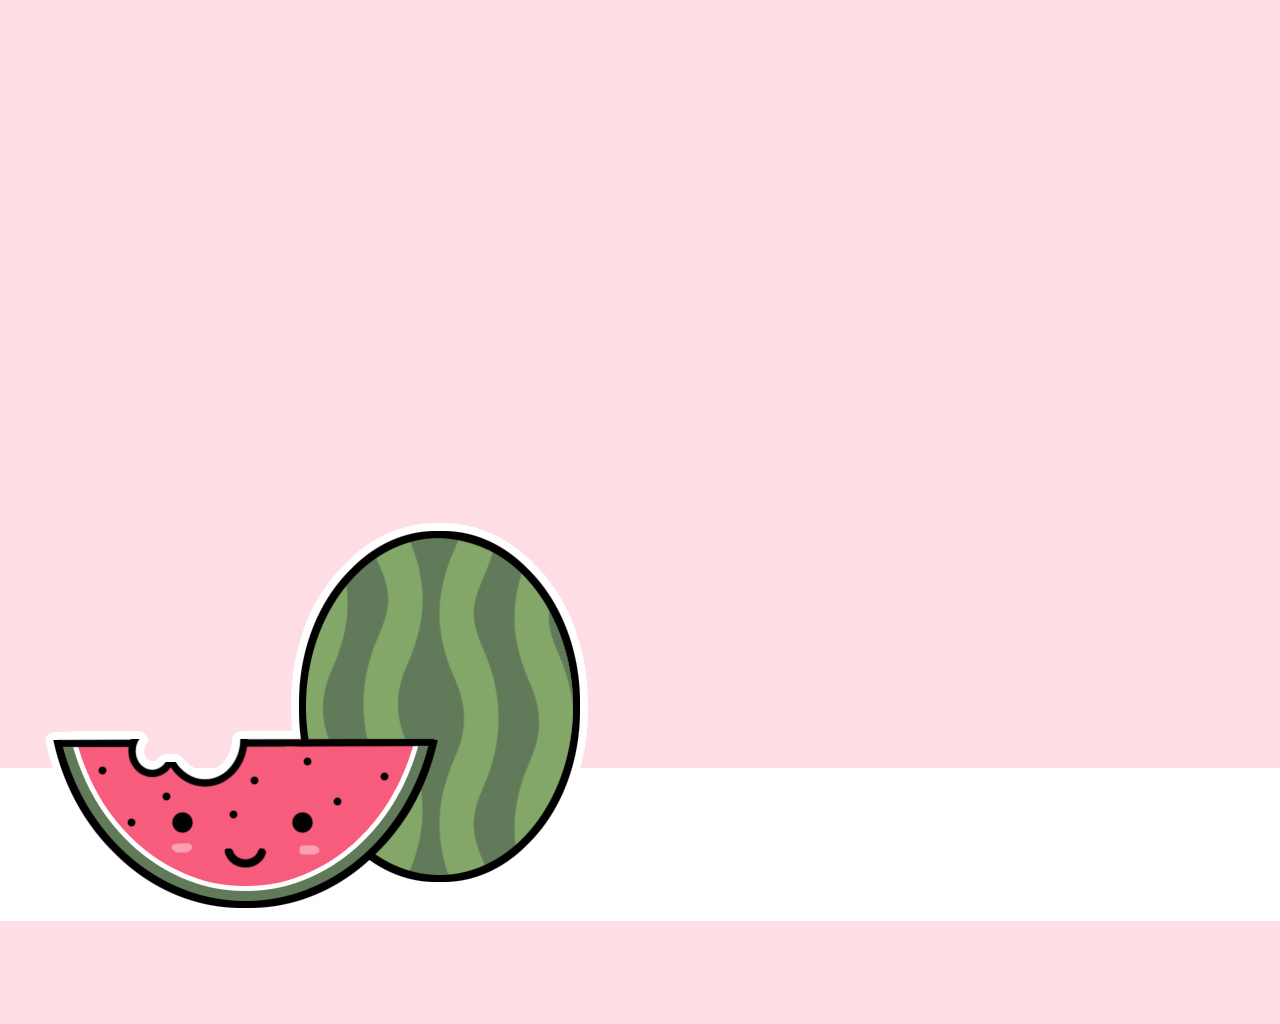 Watermelon - kawaii wallpaper